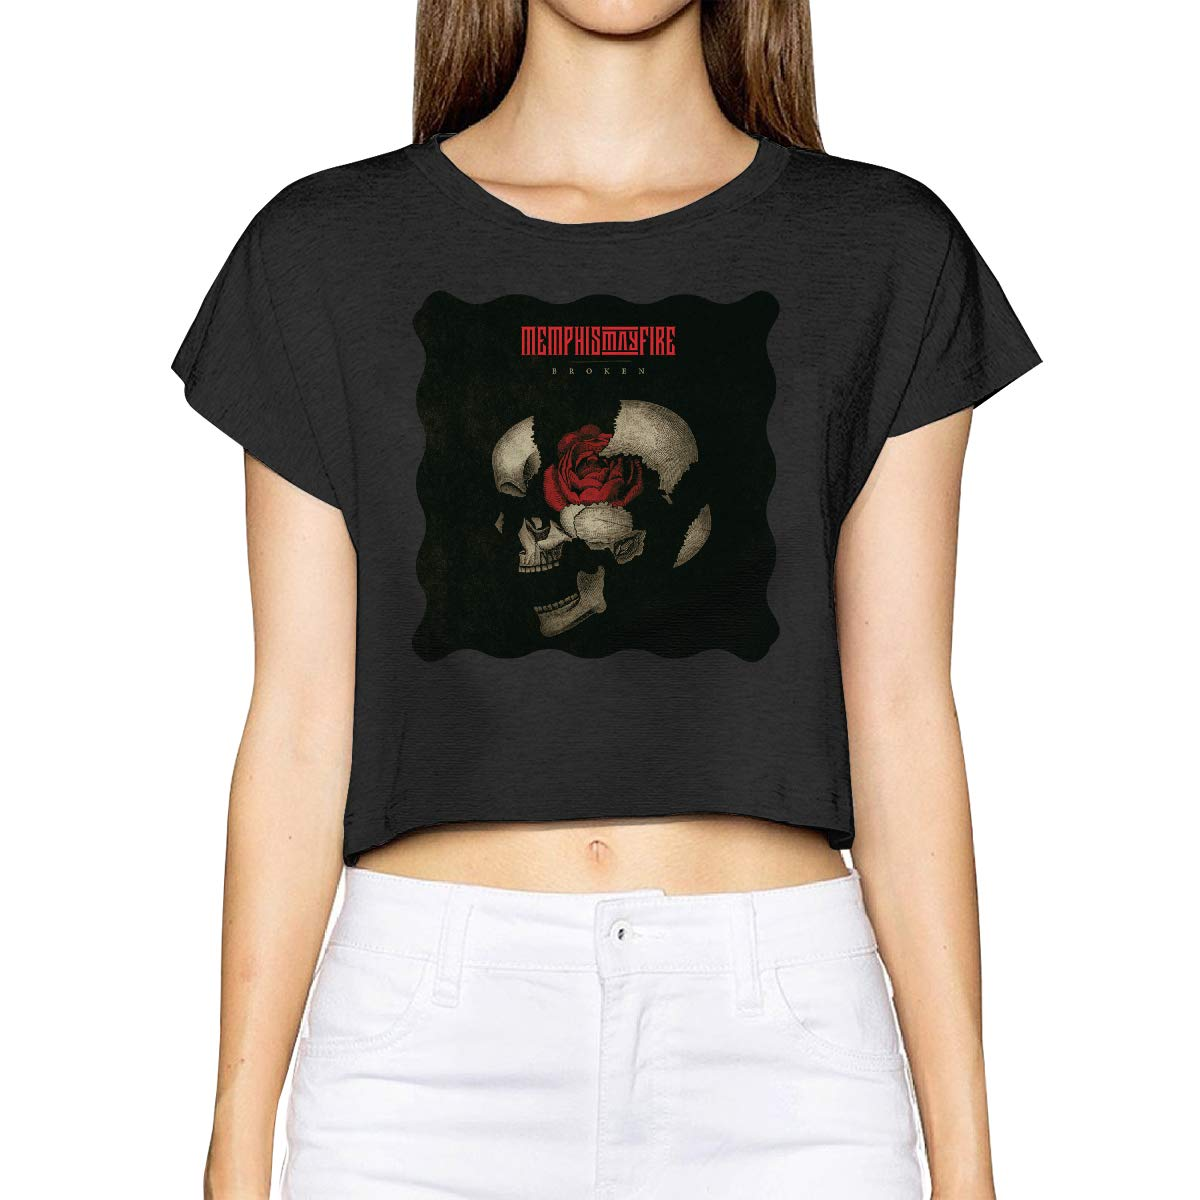 Cjlrqone Memphis May Fire Woman Fashion Leak Navel T-Shirt Black